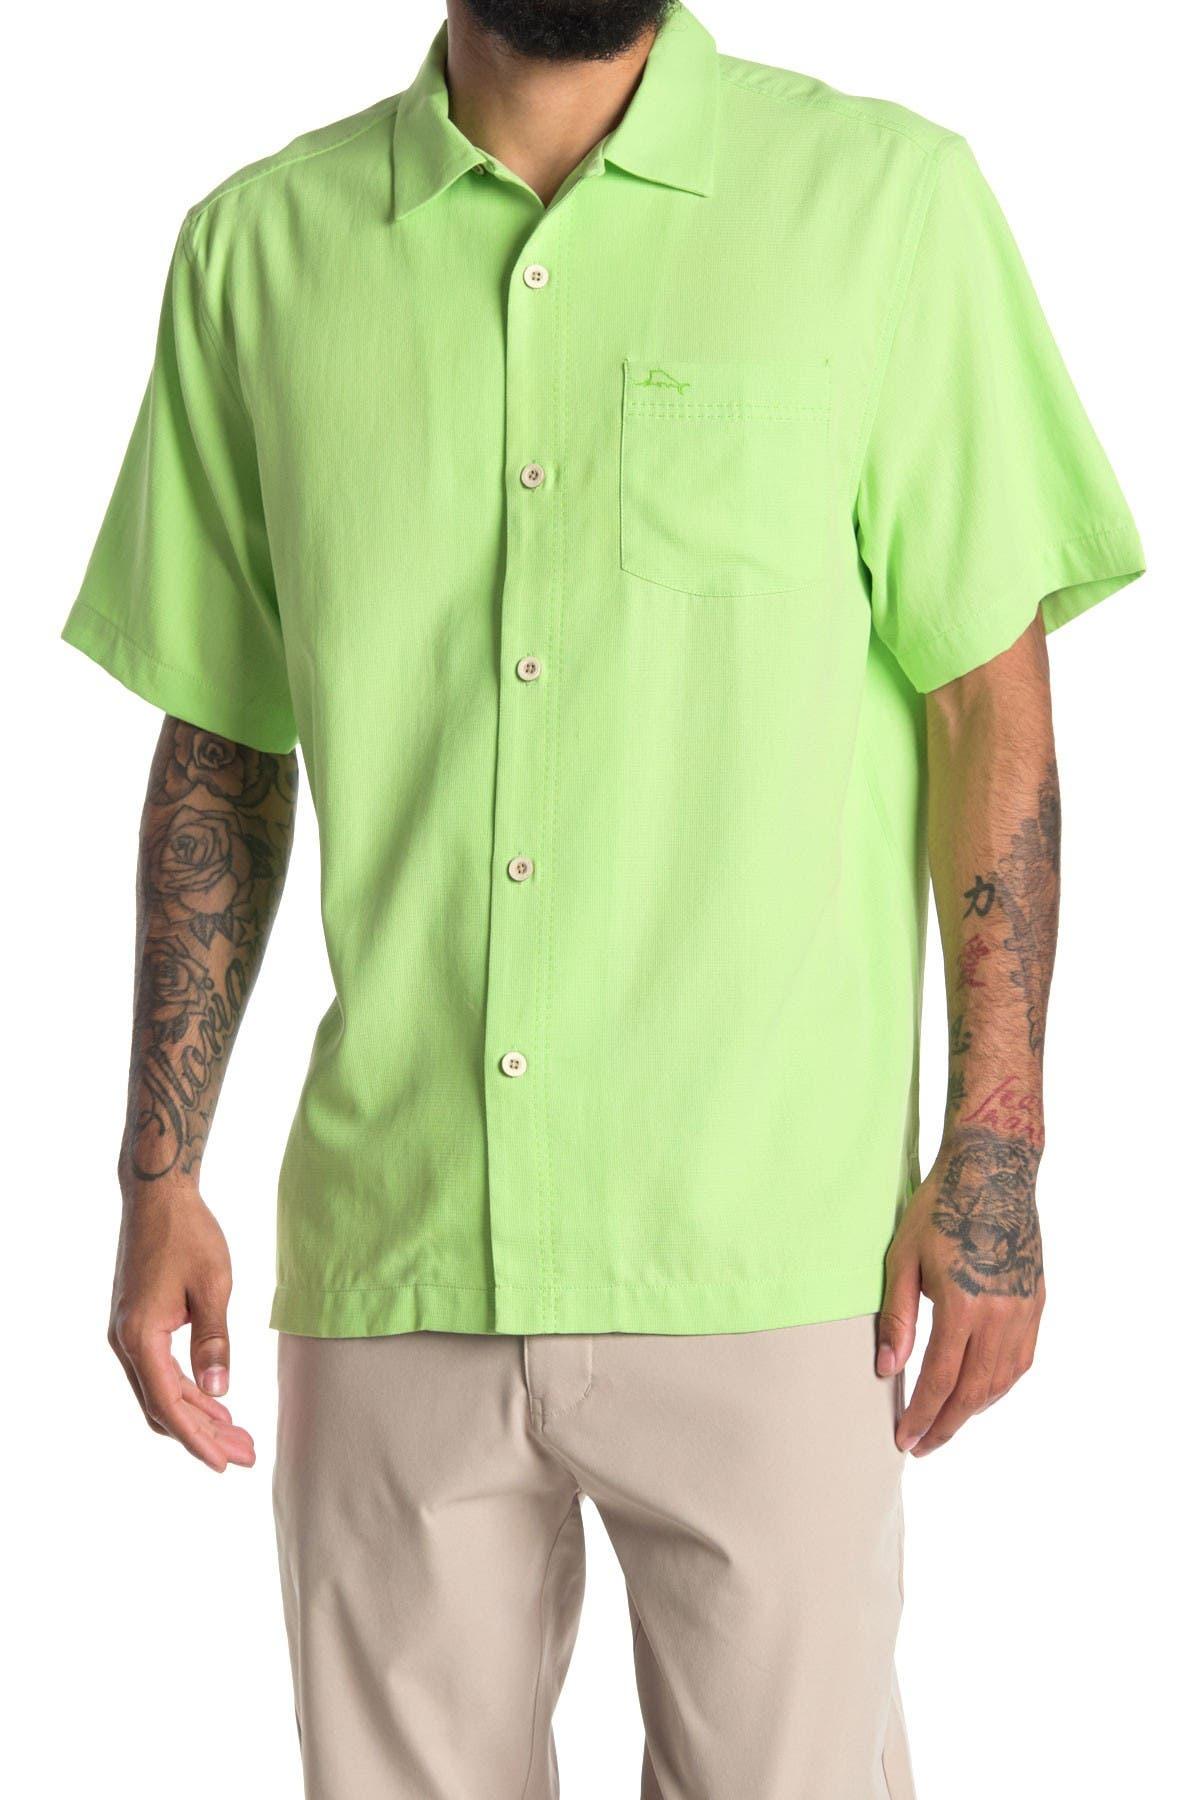 Image of Tommy Bahama Royal Bermuda Short Sleeve Regular Fit Shirt